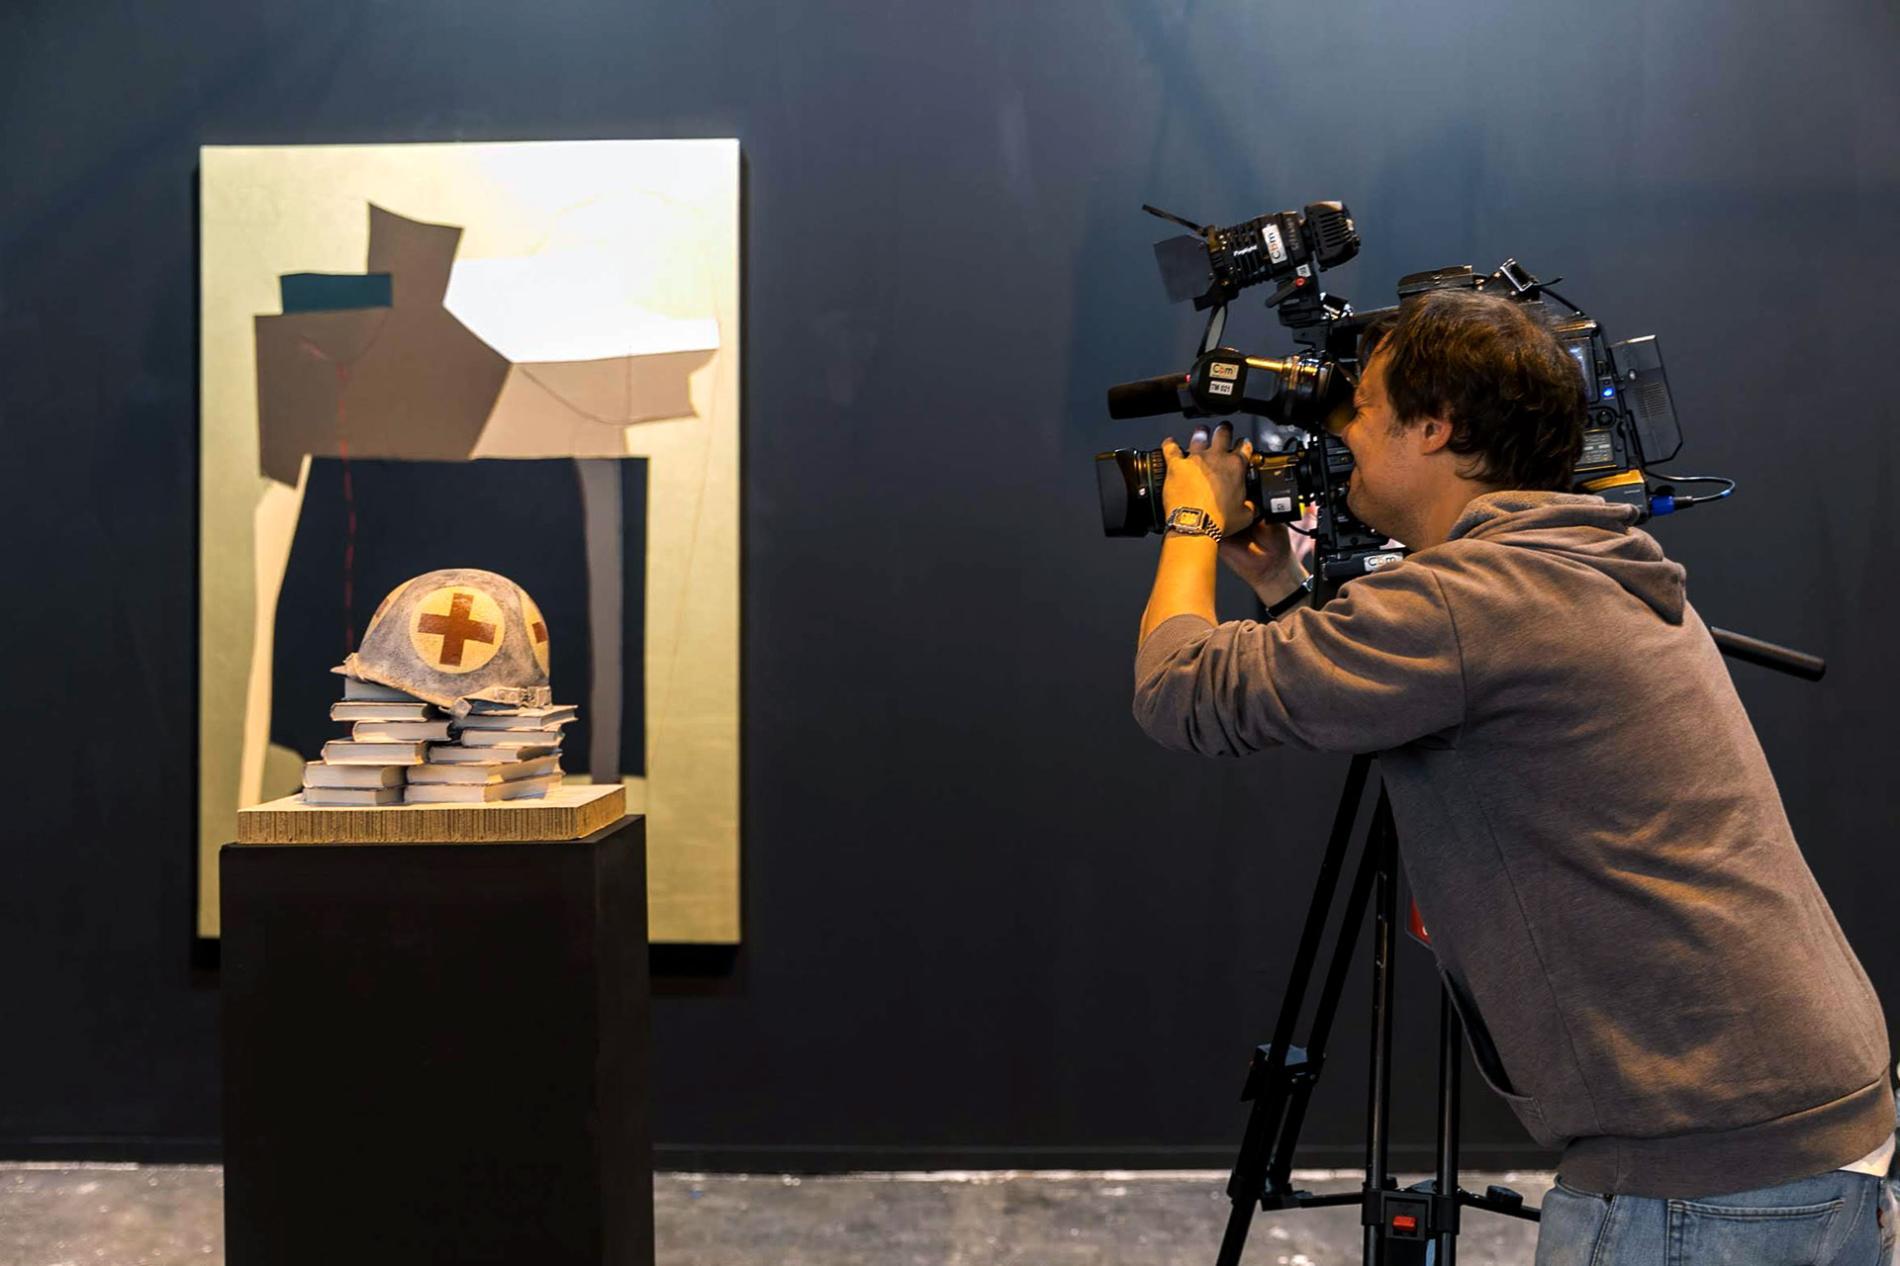 photographer immortalizing the fair